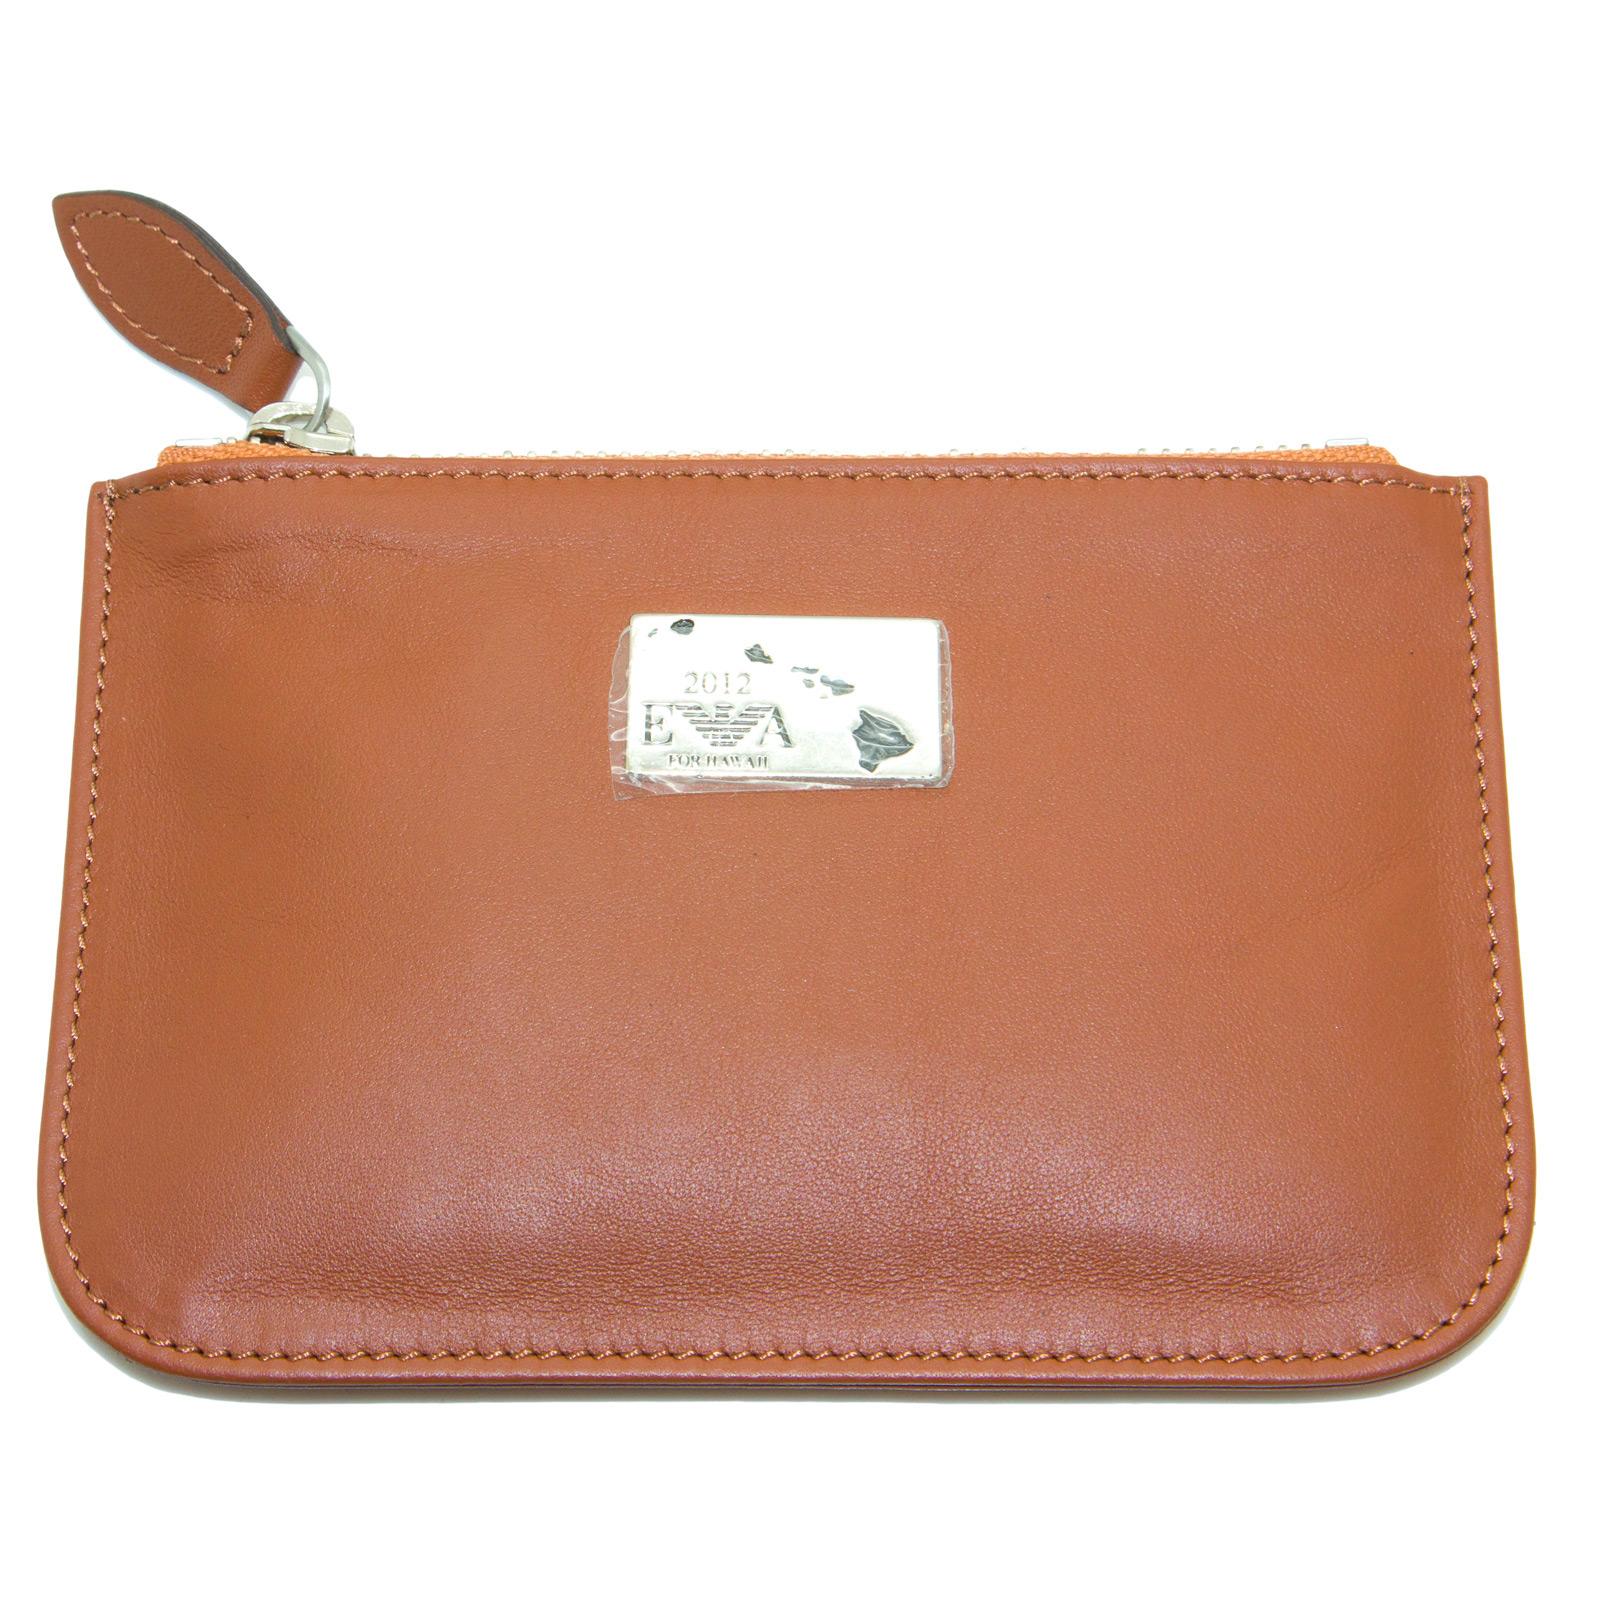 EMPORIO-ARMANI-Women-039-s-034-2012-034-Zip-Top-Coin-Purse-Wallet-YEMG99-195-NWT thumbnail 8